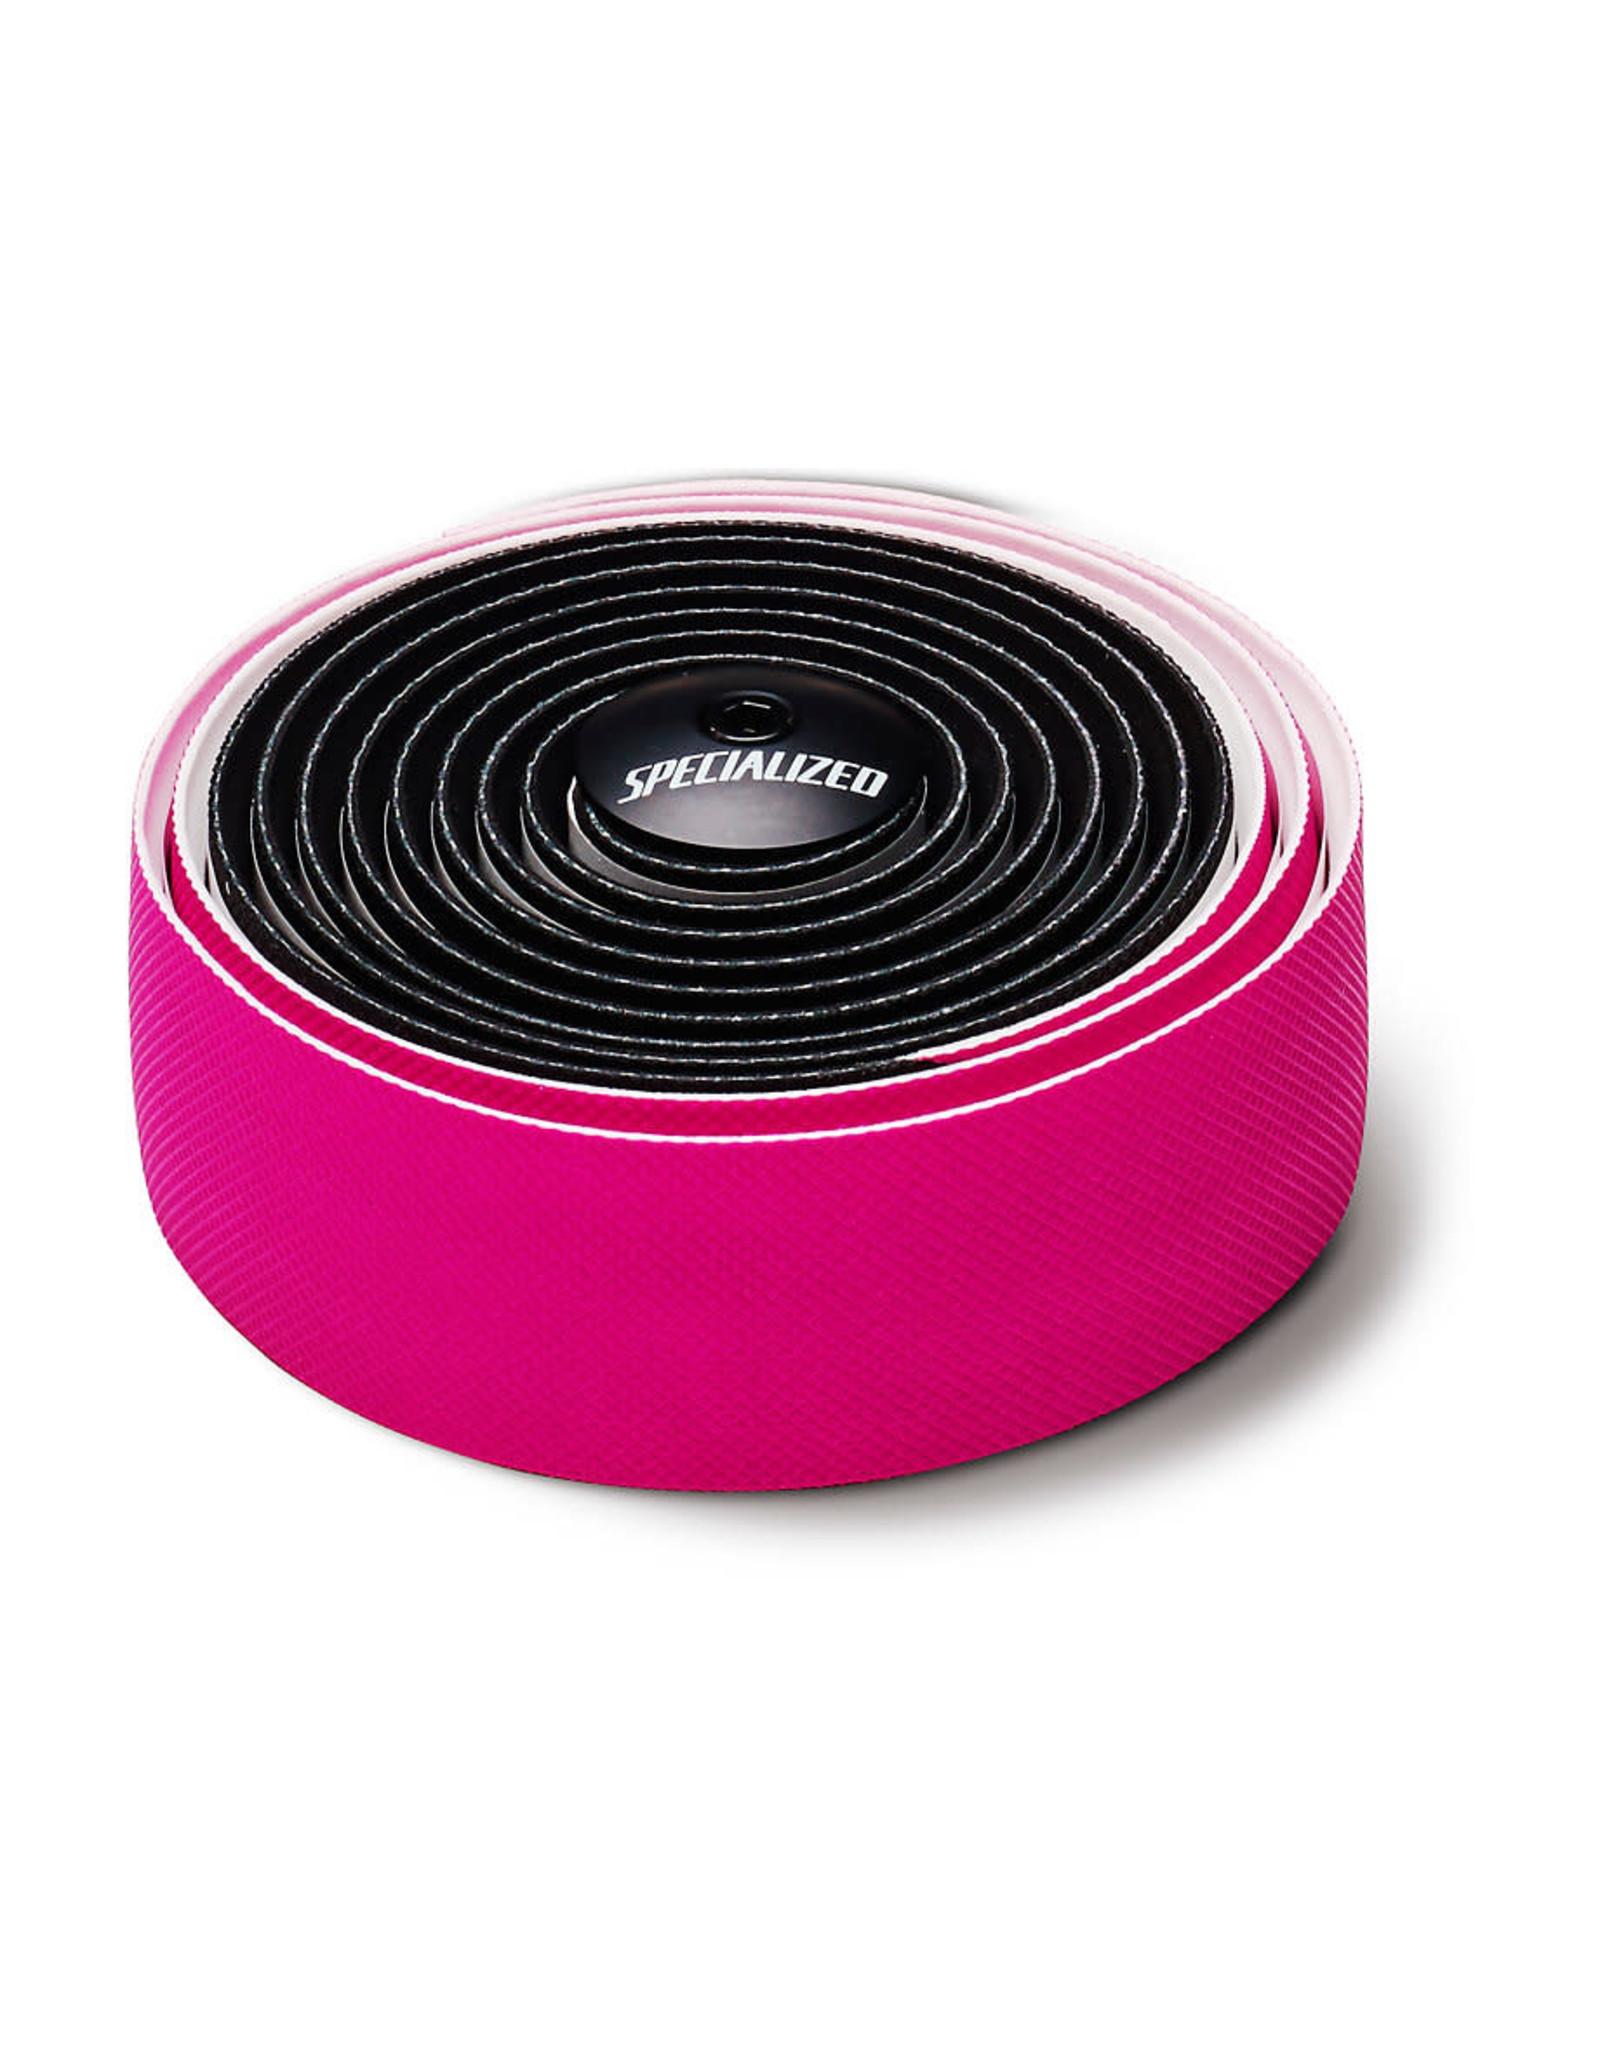 Specialized SPECIALIZED, Bar Tape, S-Wrap HD